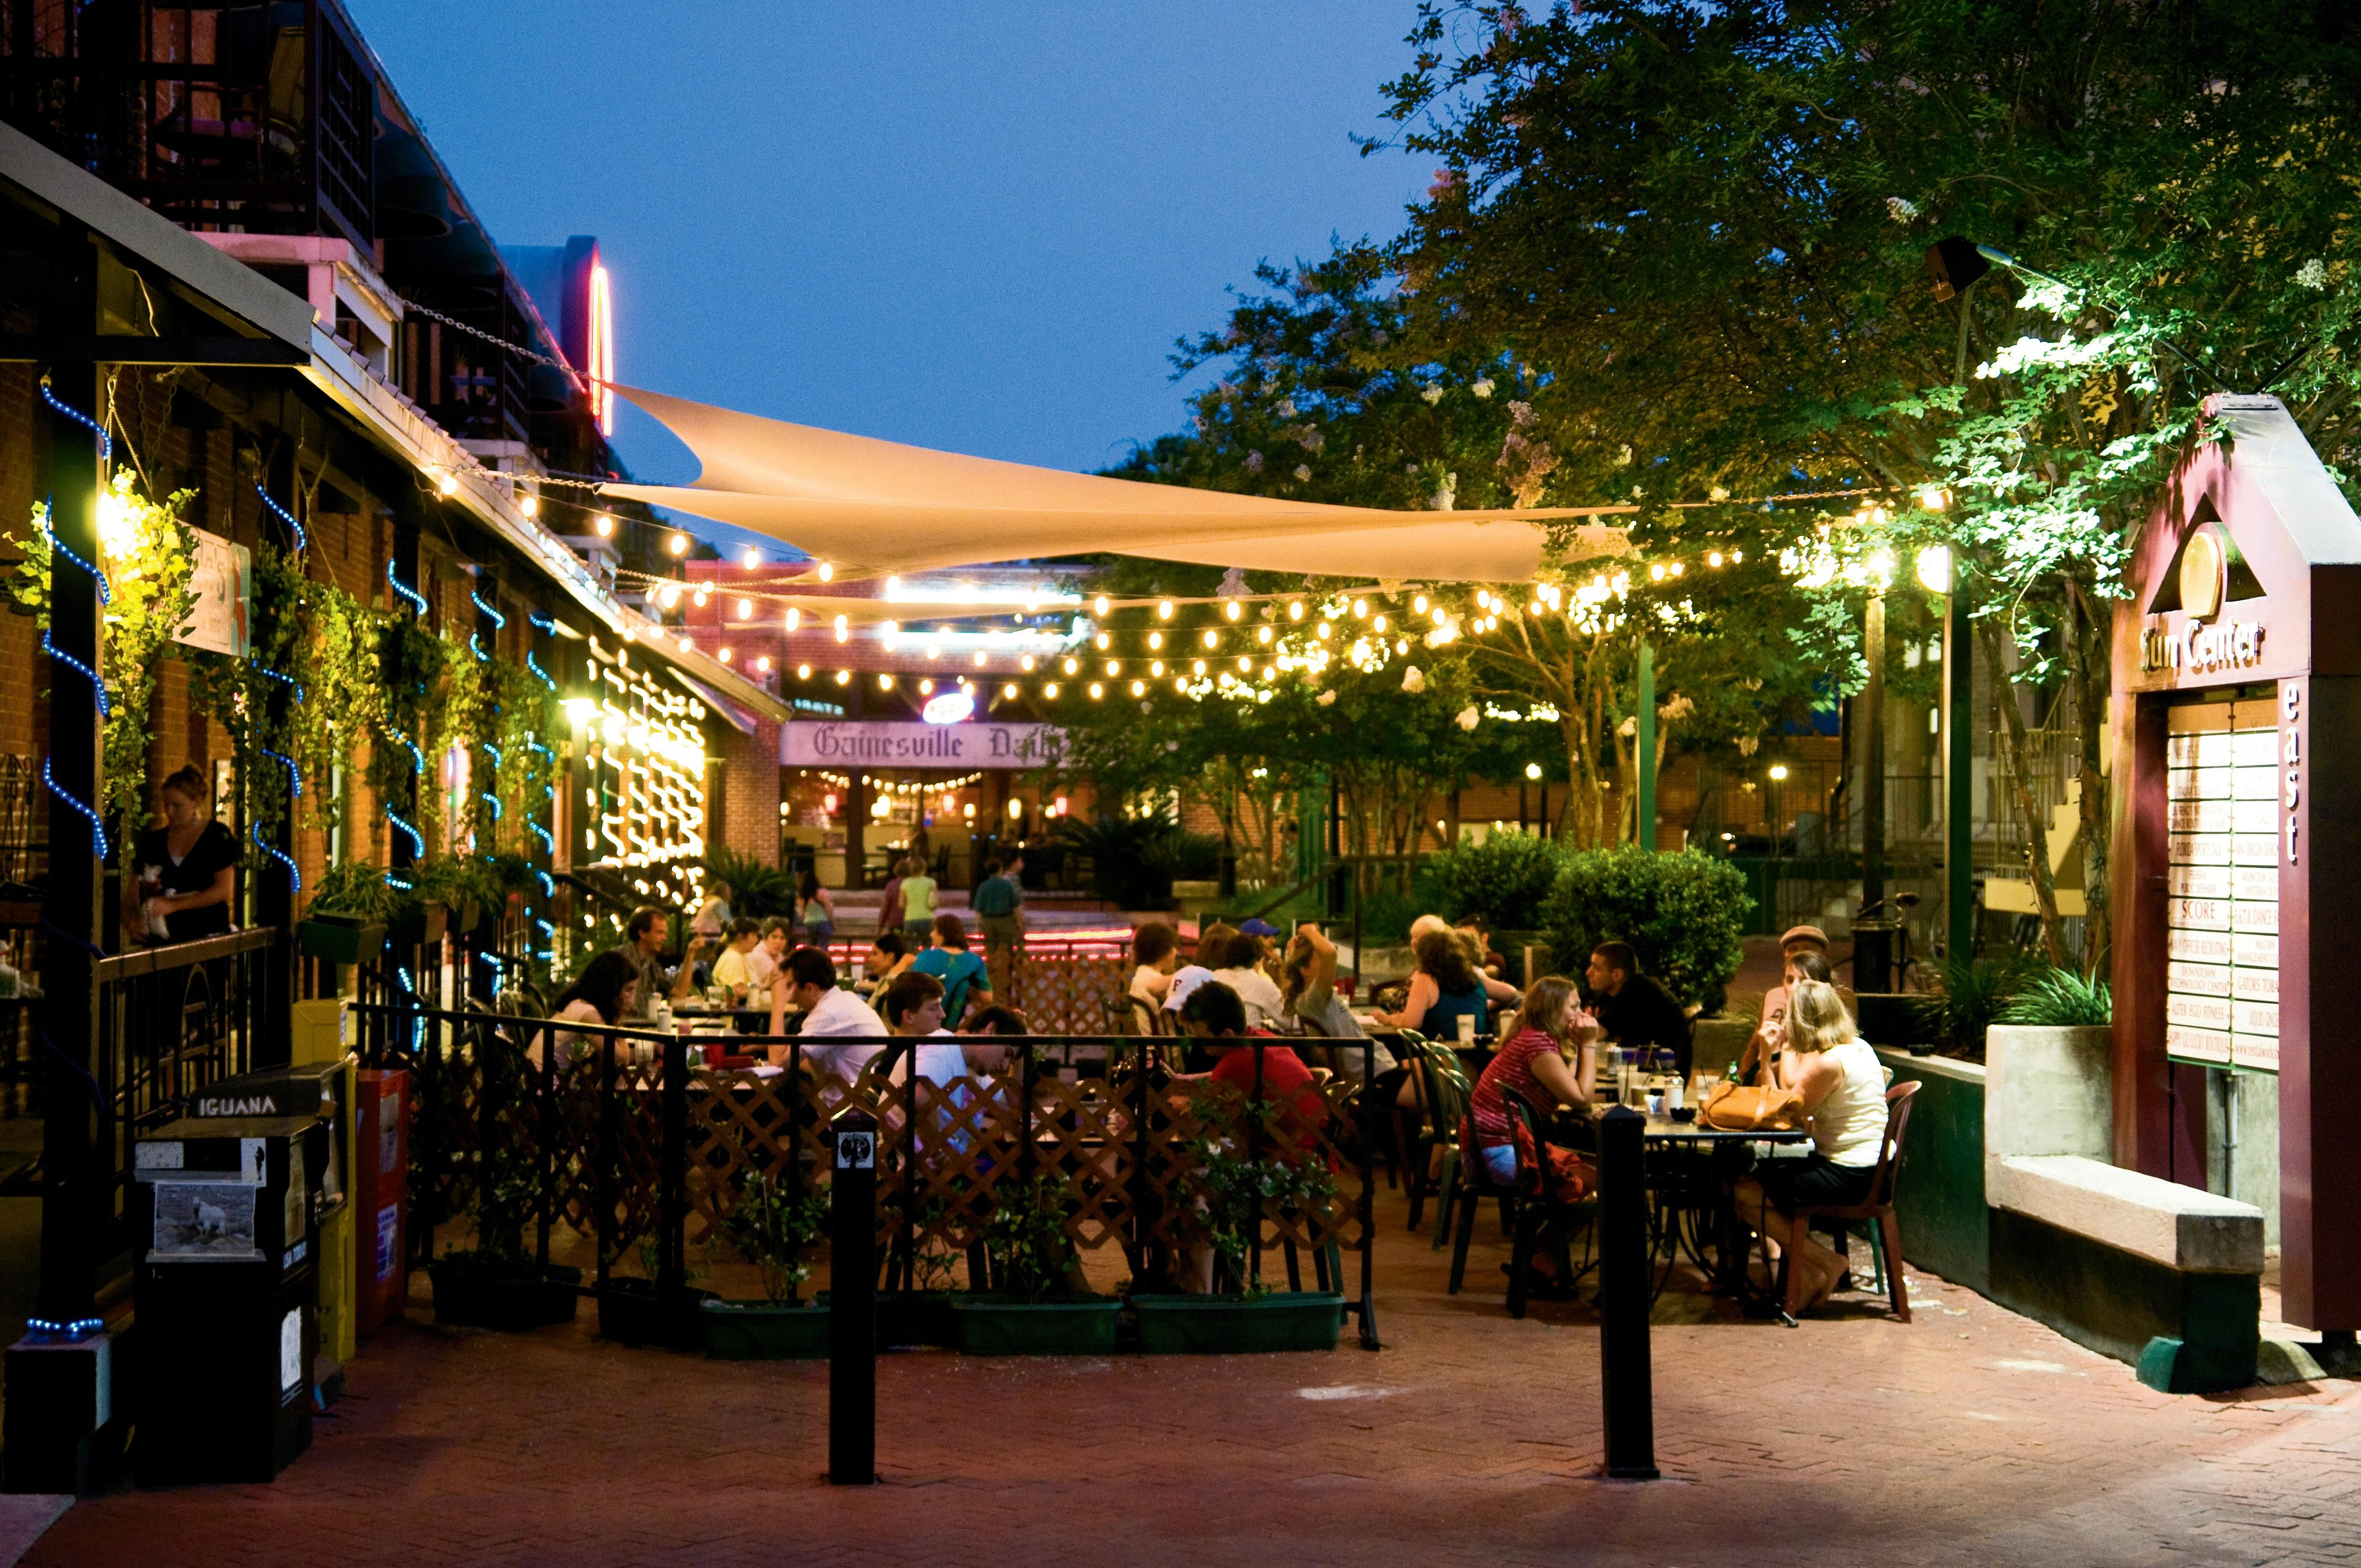 Explore Downtown Gainesville Fl Gainesville Florida College Town Visit Florida